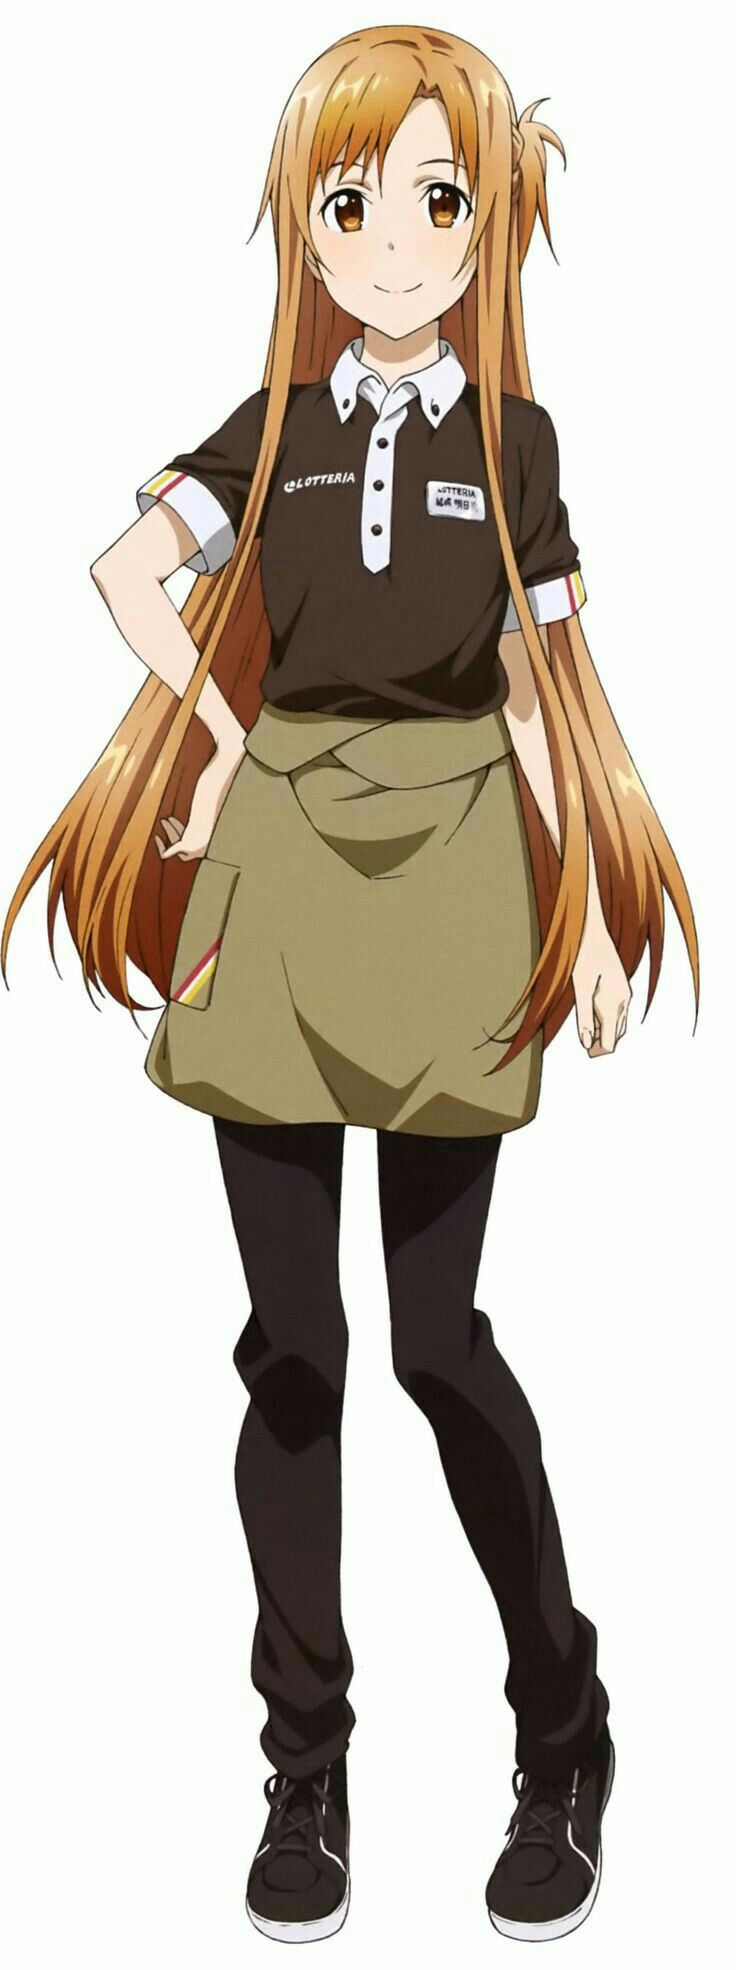 Dress up games favourites by asuna and kirito on deviantart - Asuna